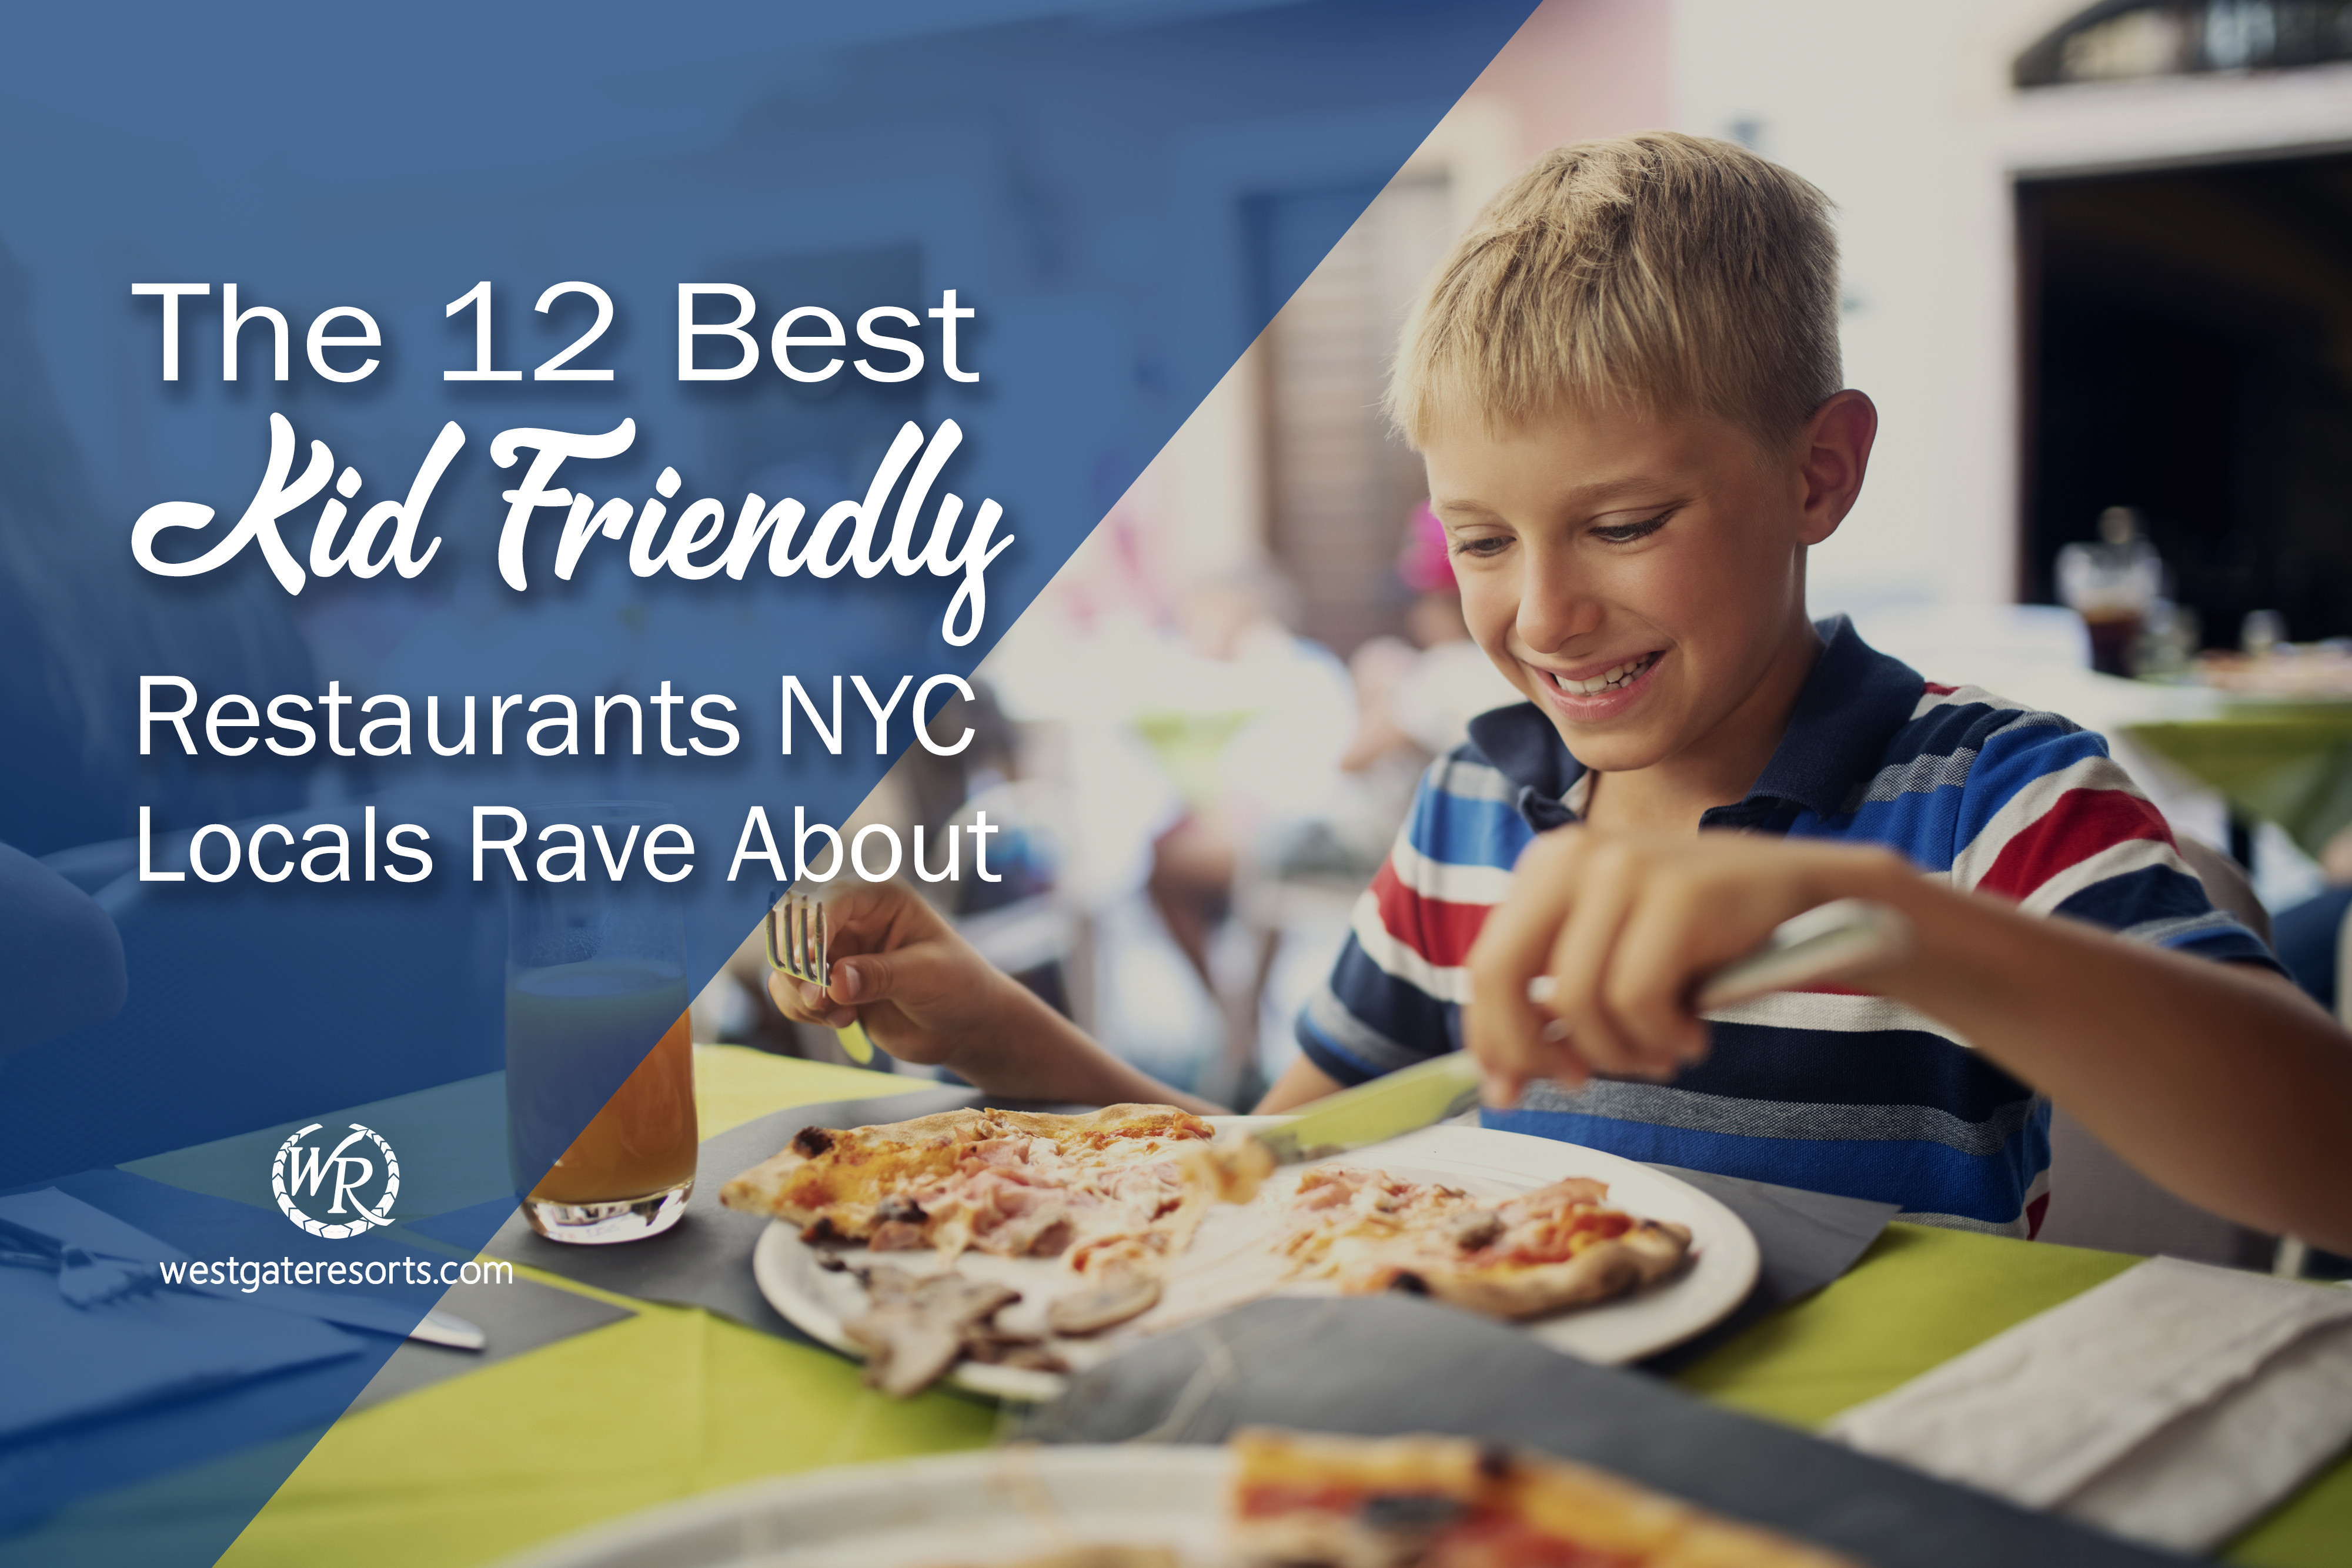 The 12 Best Kid Friendly Restaurants NYC Locals Rave About